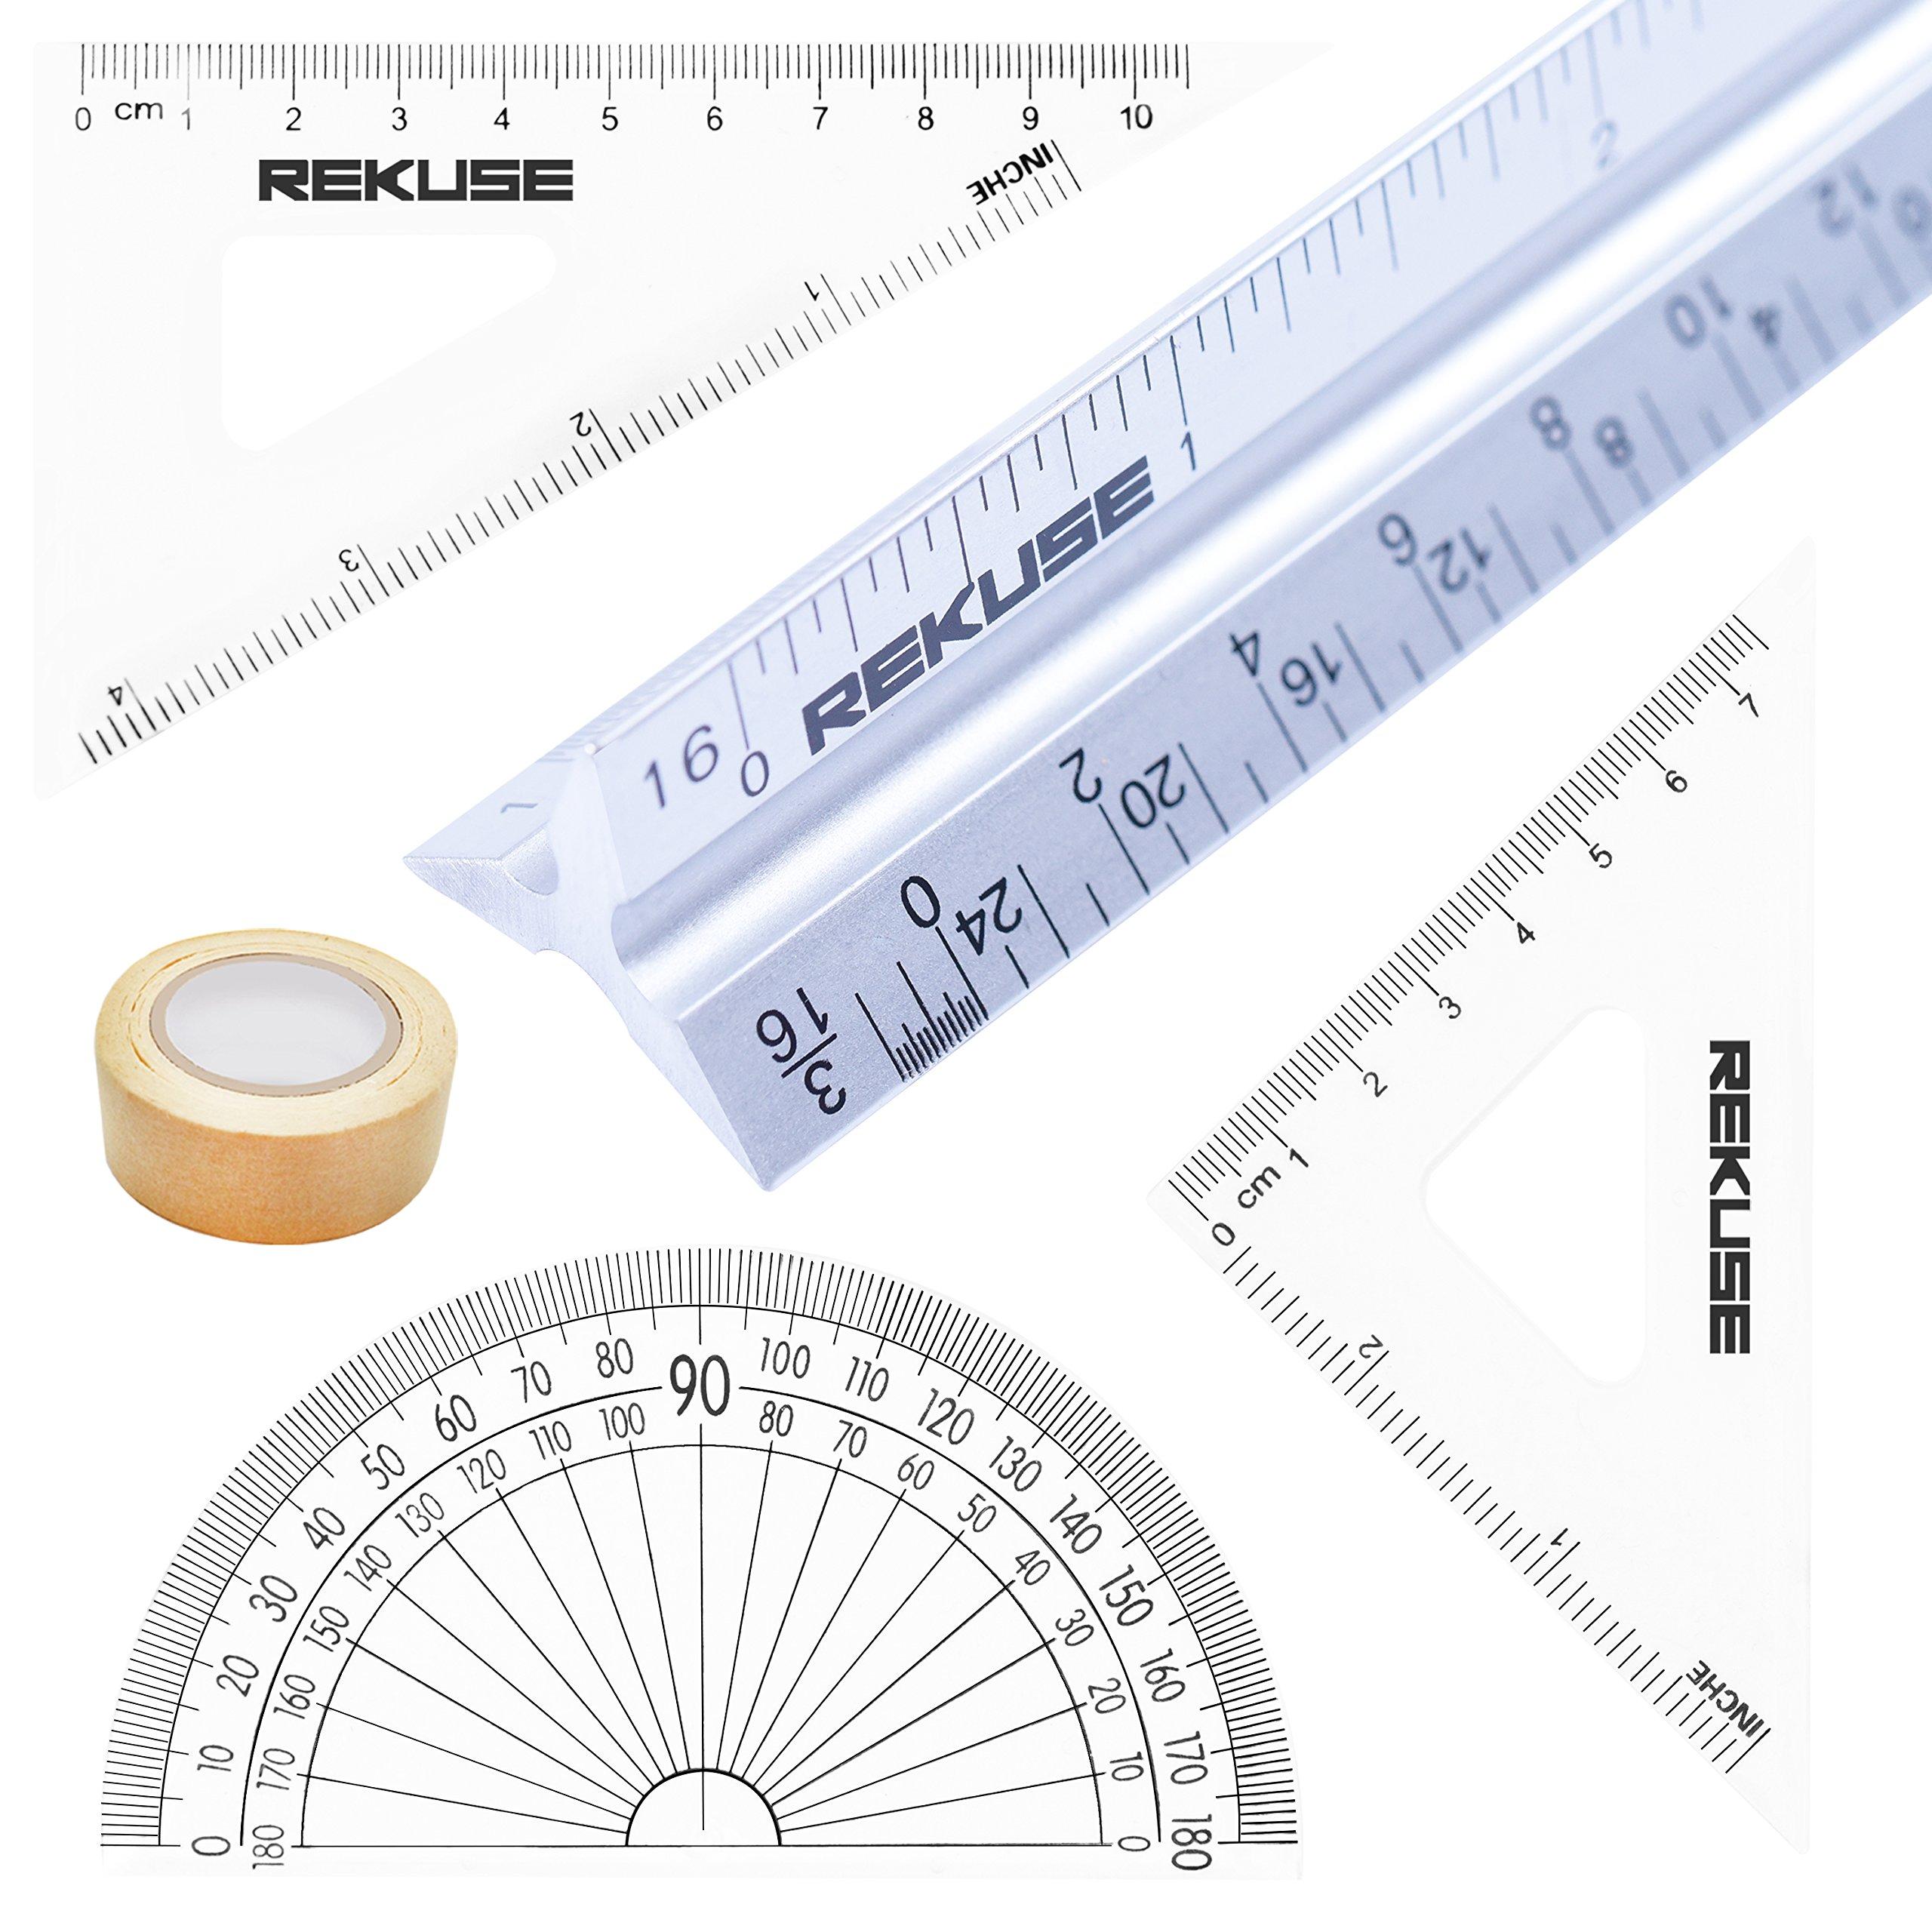 REKUSE 12'' Architectural scale, Triangular Engineer Ruler, Aluminium, Draftsman & Student + Geometry Set with Protractor + Masking Tape